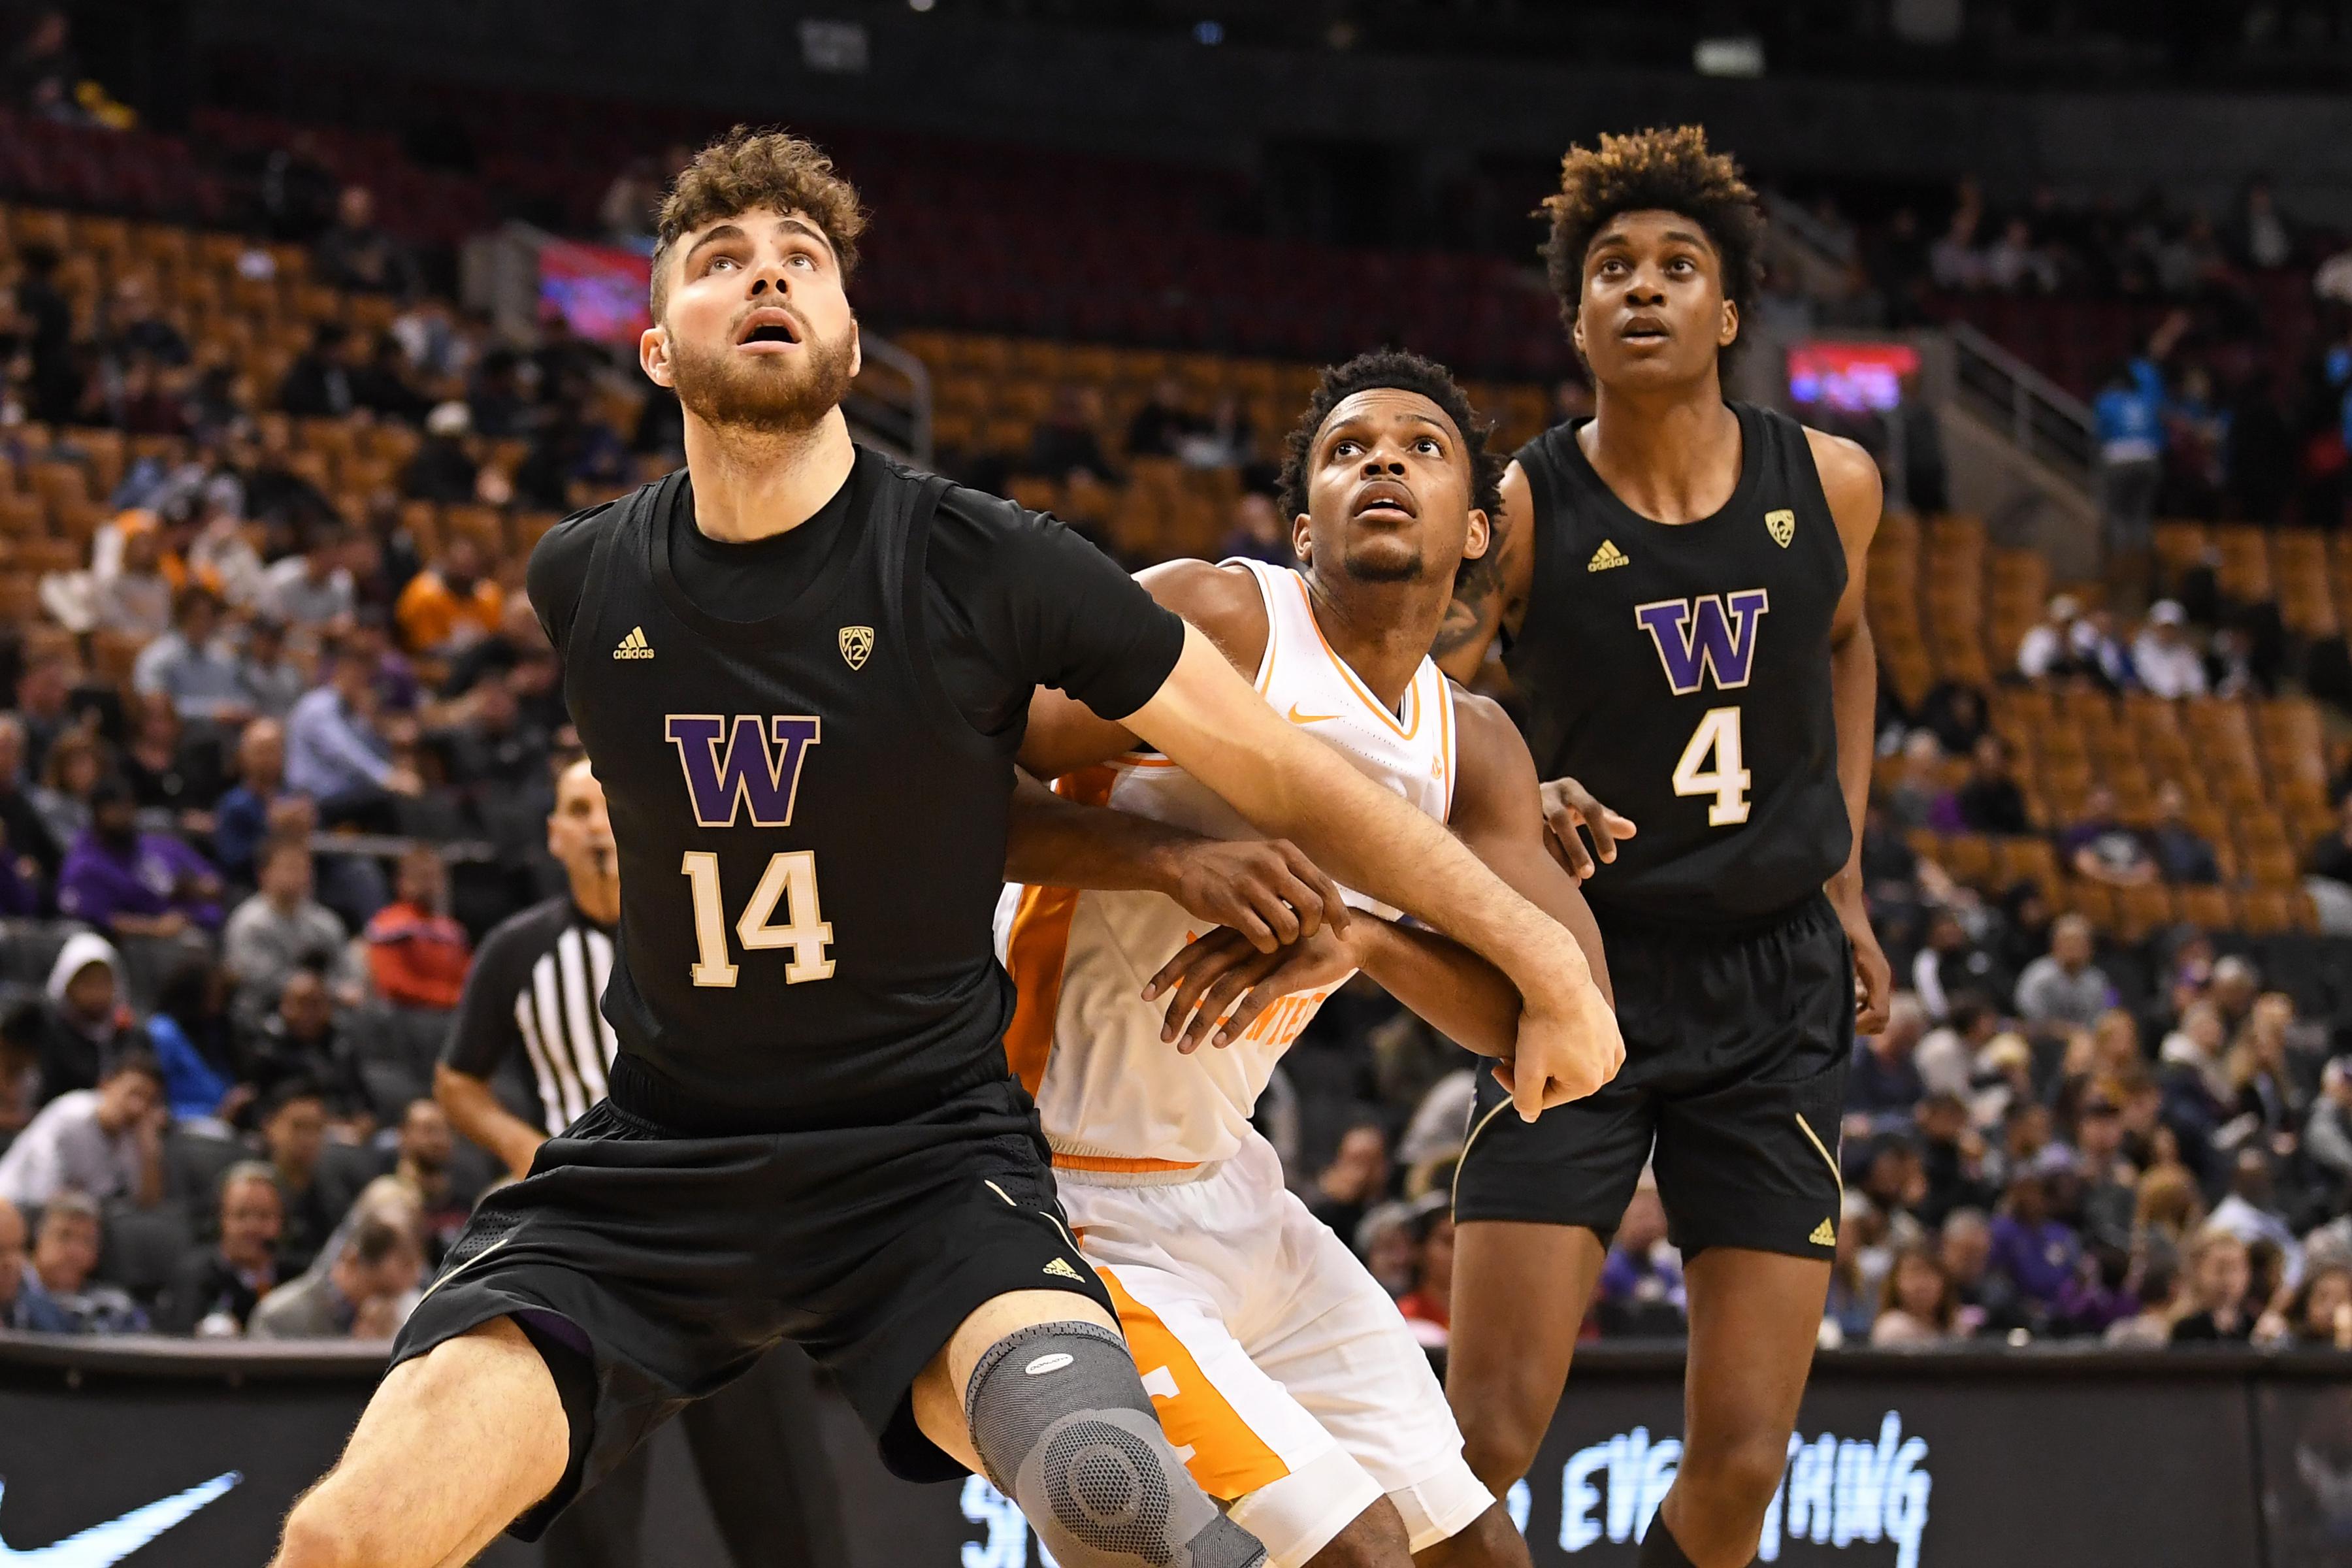 NCAA Basketball: Washington at Tennessee